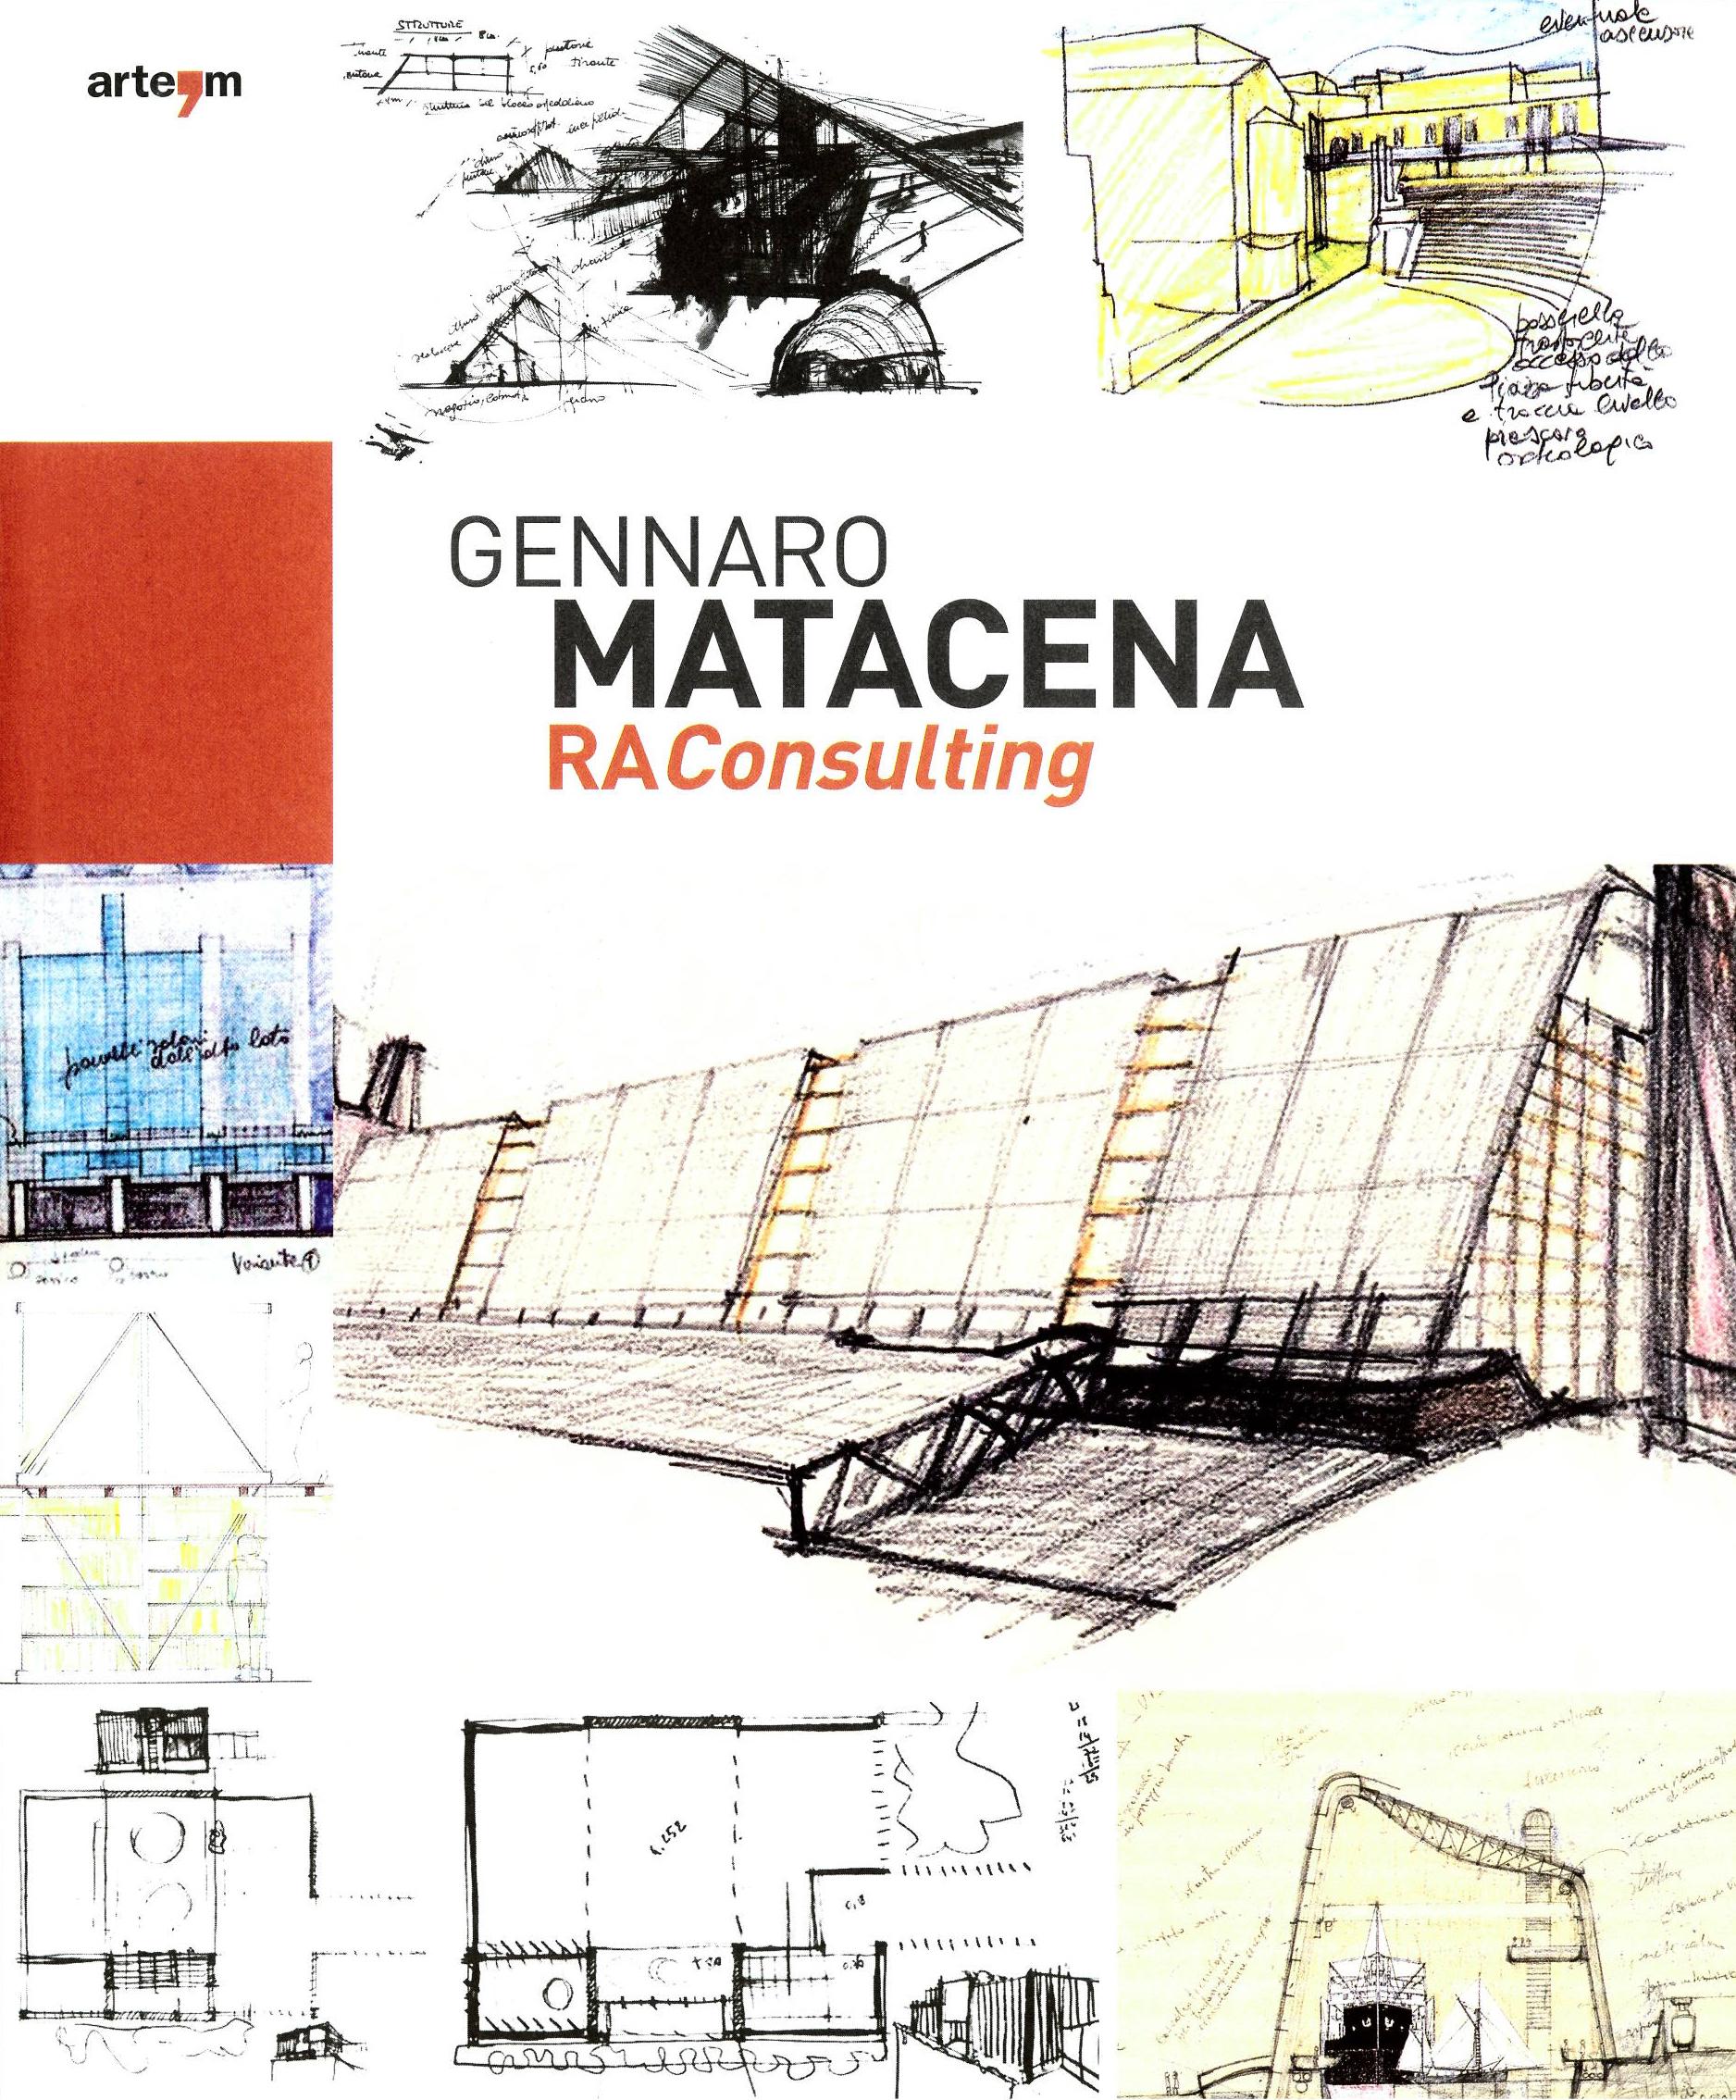 Gennaro Matacena RA Consulting